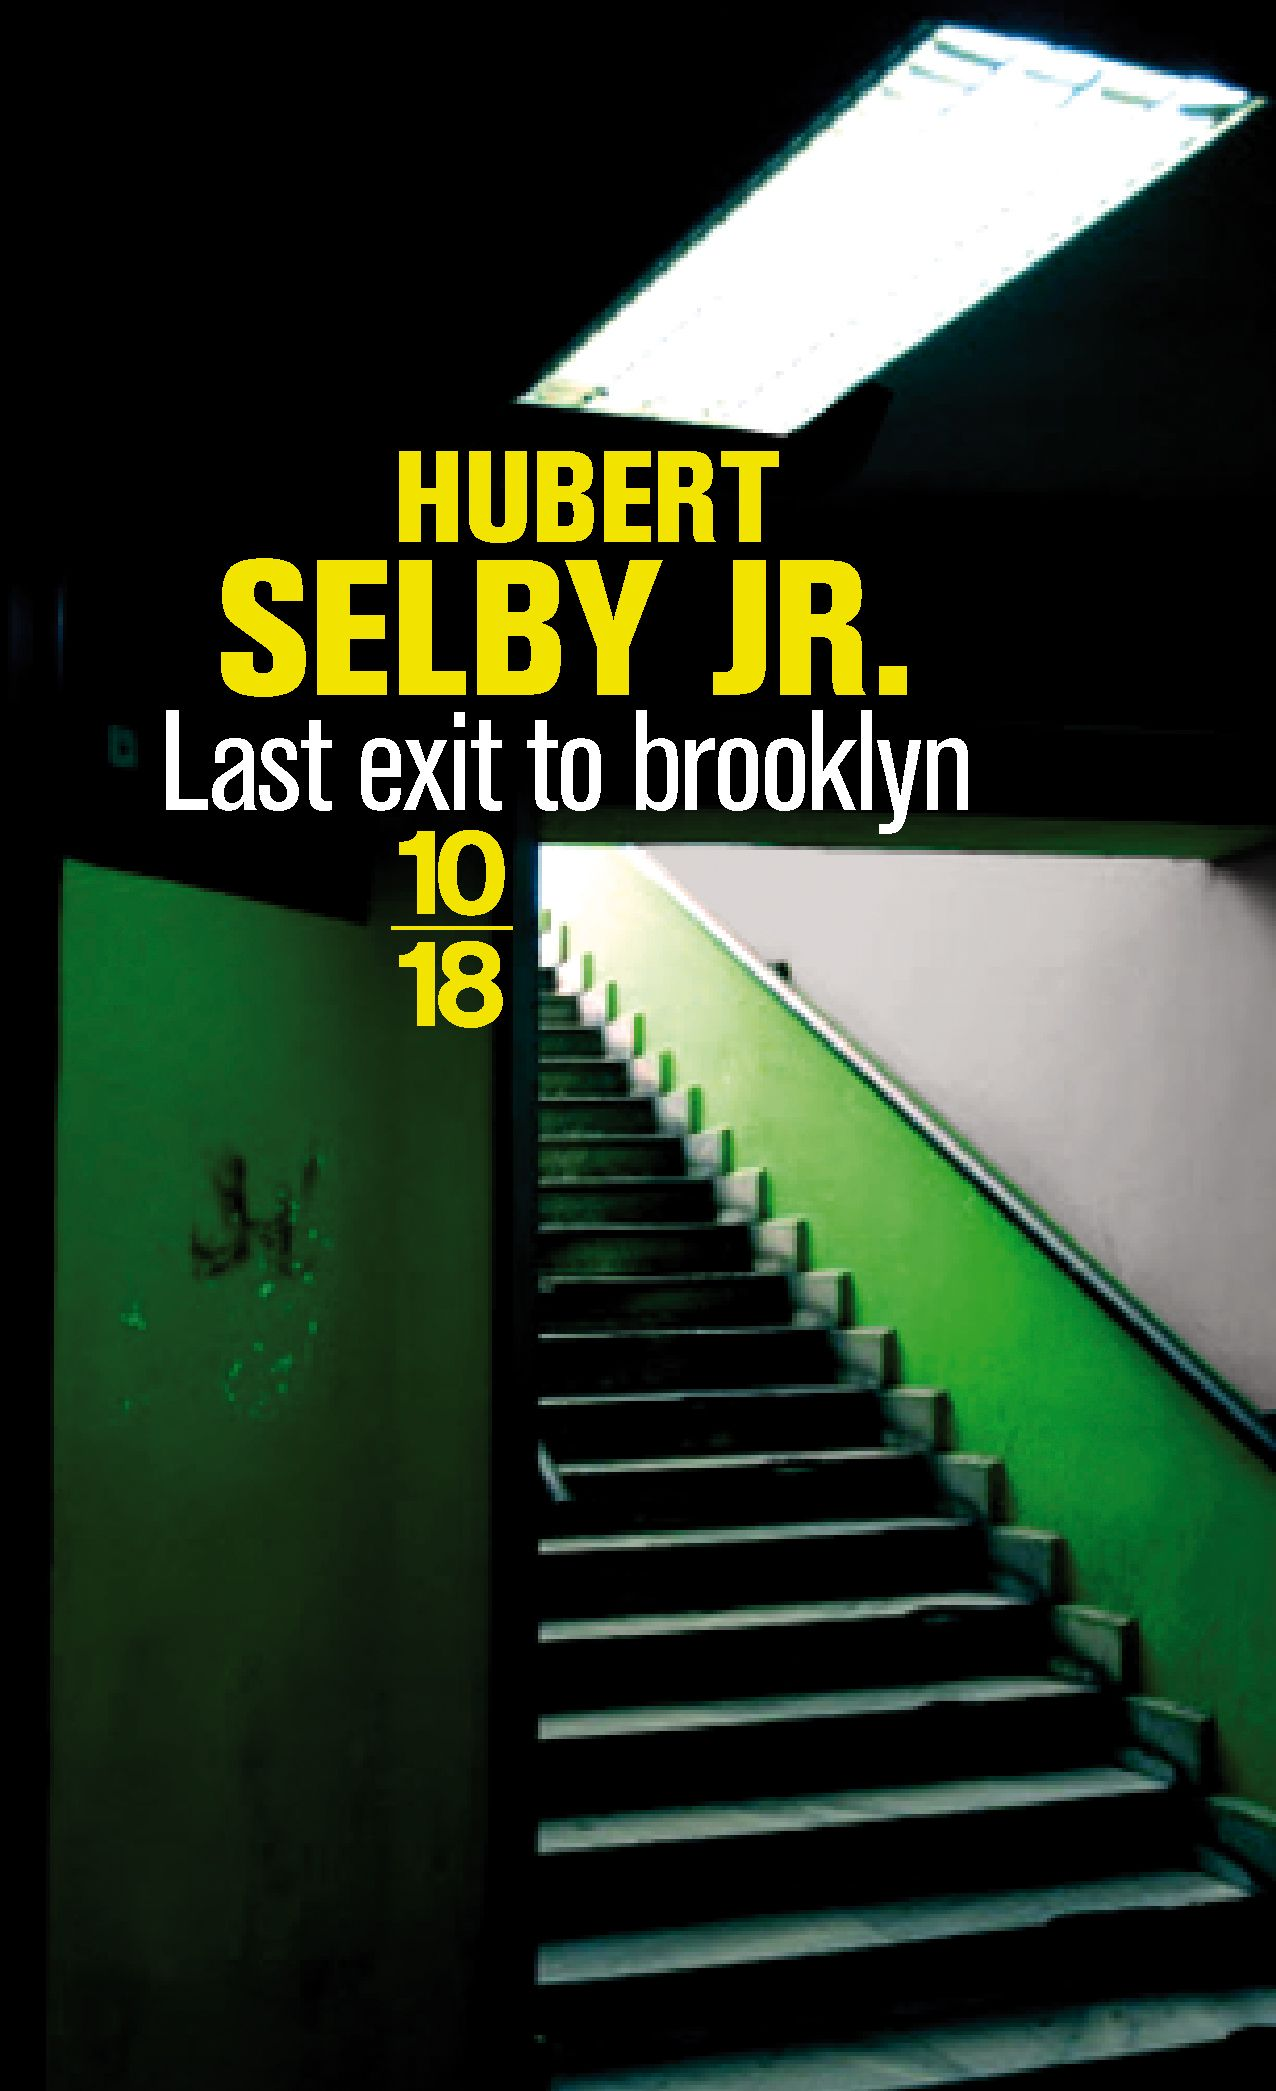 Hubert Selby Jr. - Last exit to brooklyn